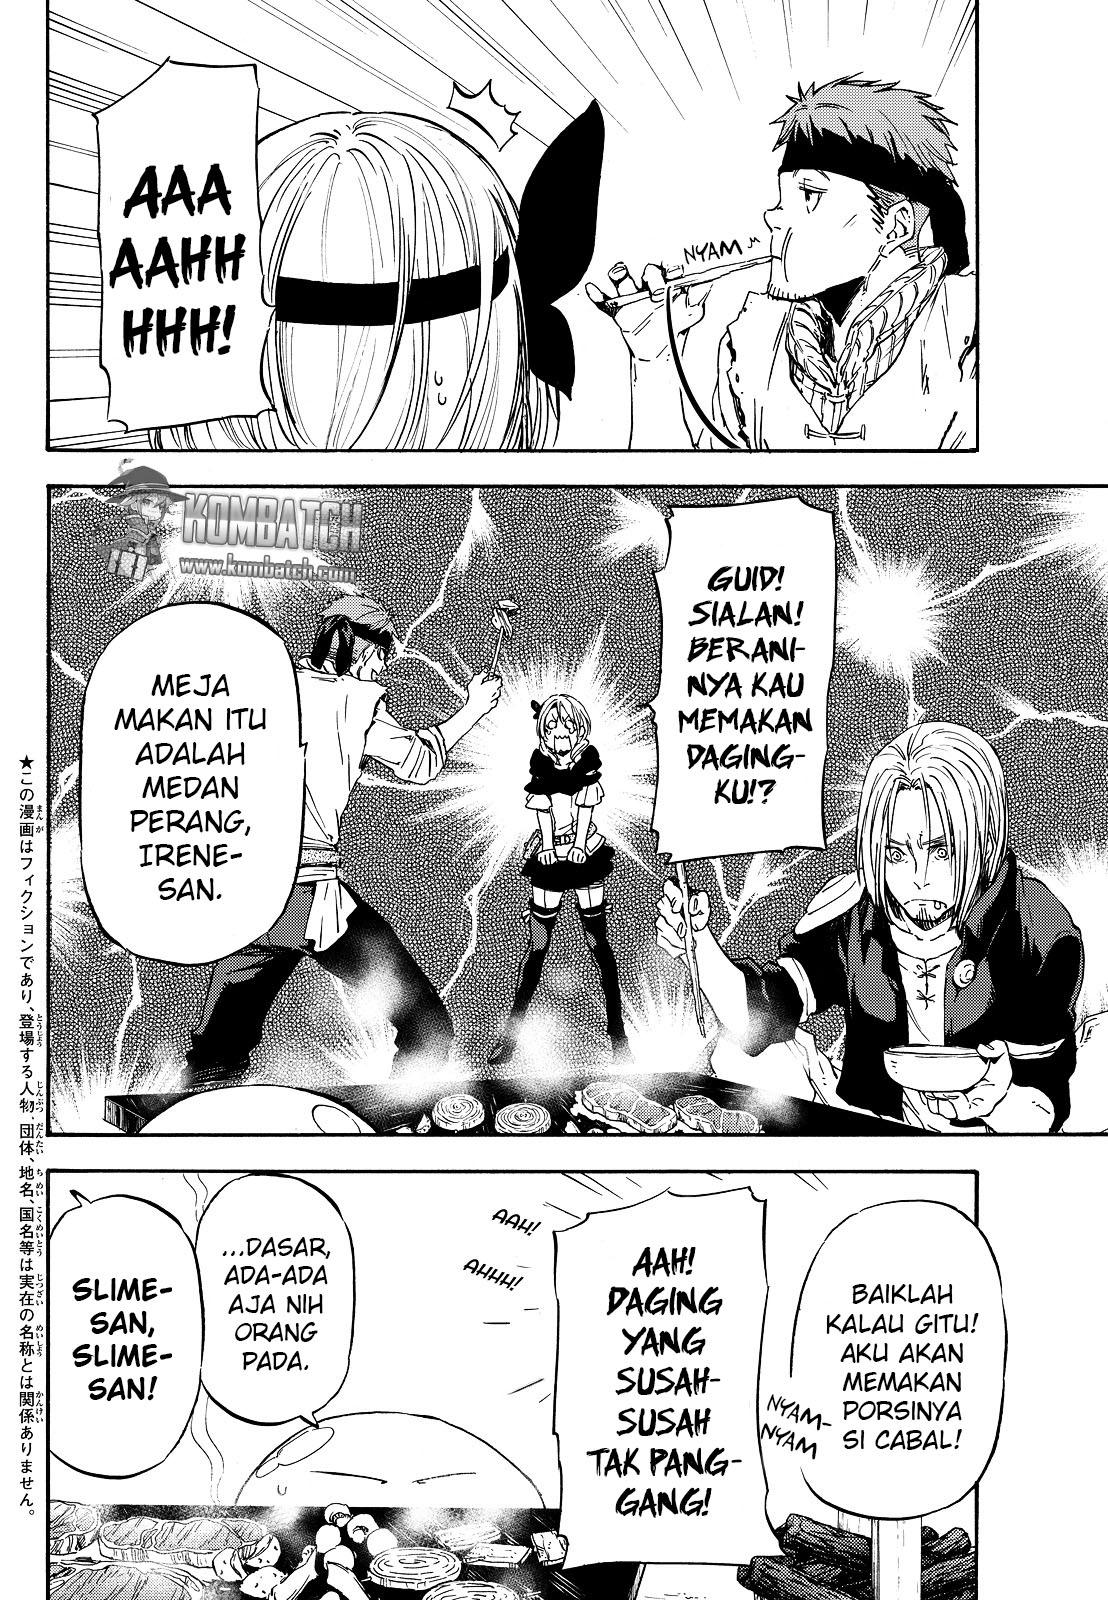 Baca Manga Tensei Shitara Slime Datta Ken Chapter 9 Bahasa Indonesia